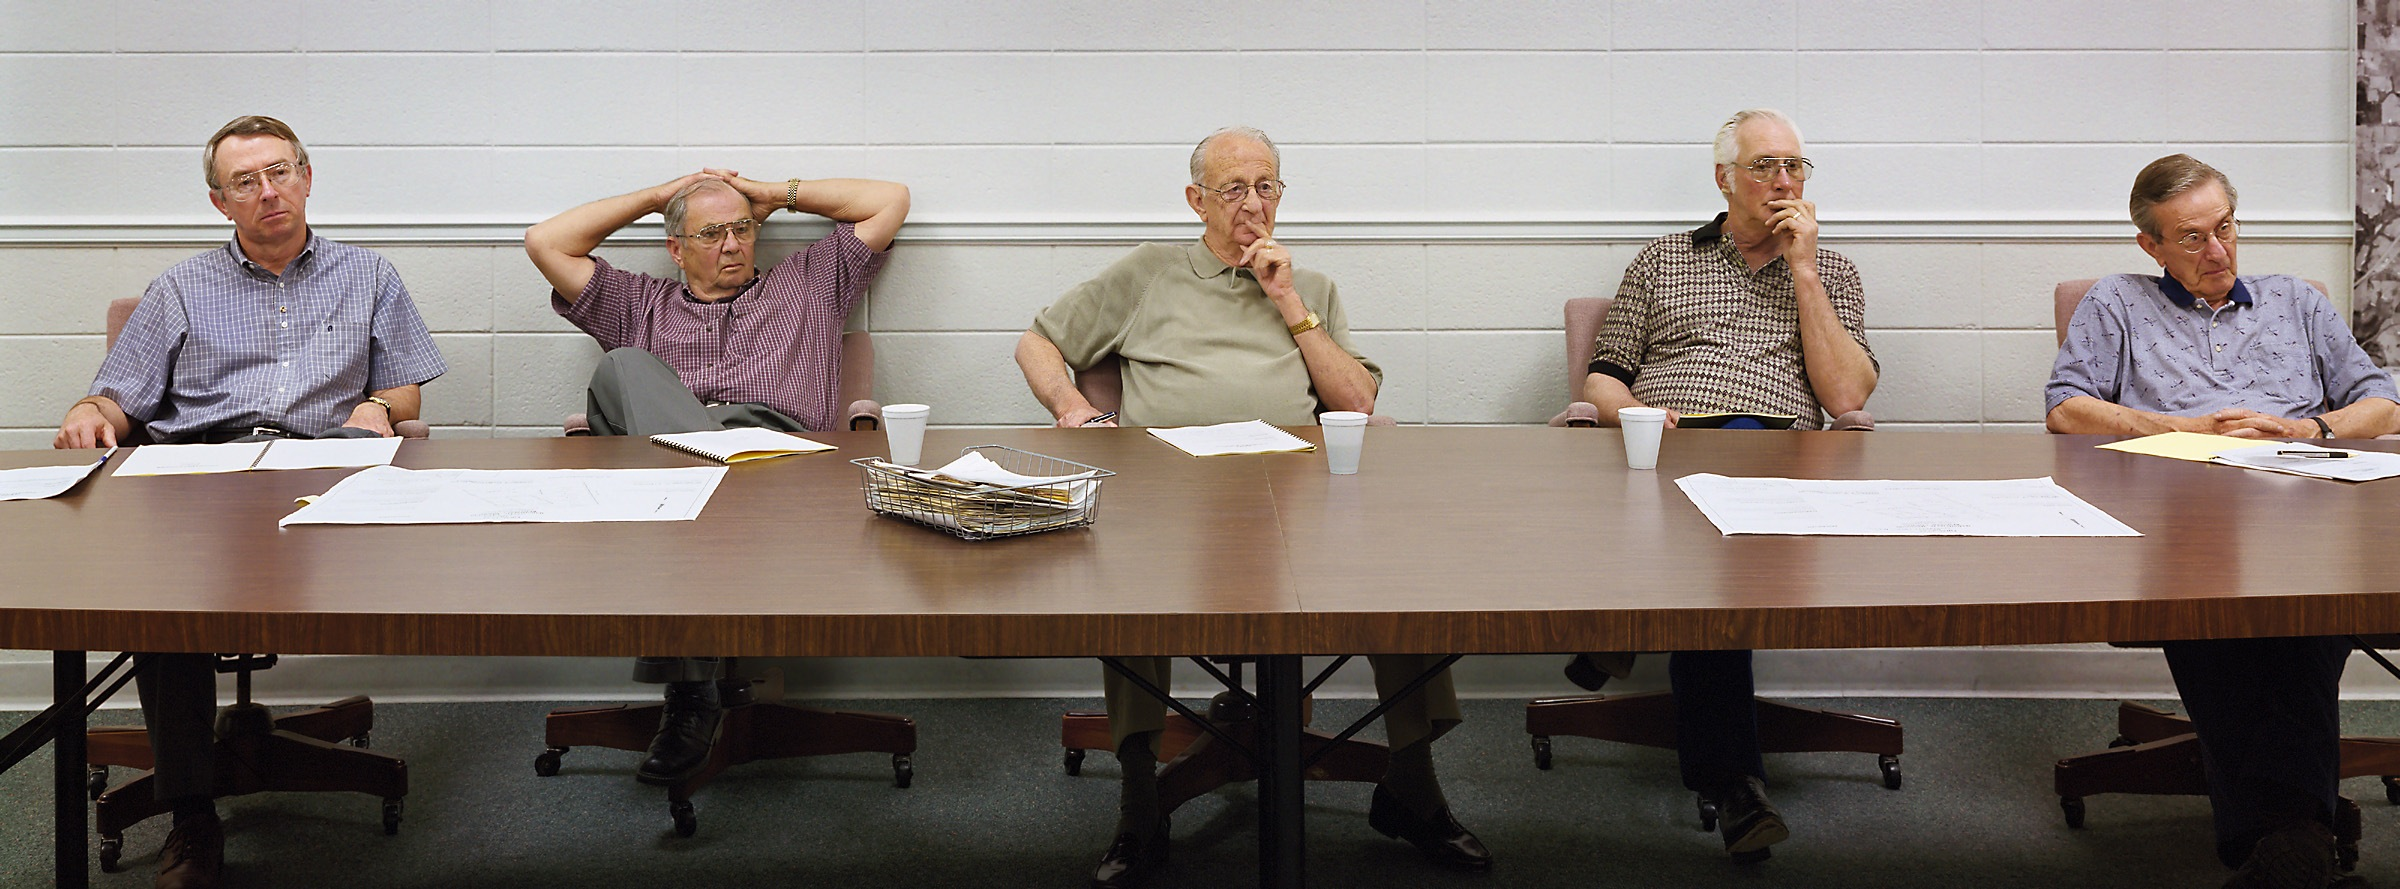 Marshfield, Missouri (population 4,508) Board of Aldermen, May 23, 2002 (L to R): Jack Watters, Jim Downing, C.R. Clark (Mayor), Talt Greer, Tom Owen, 2002.